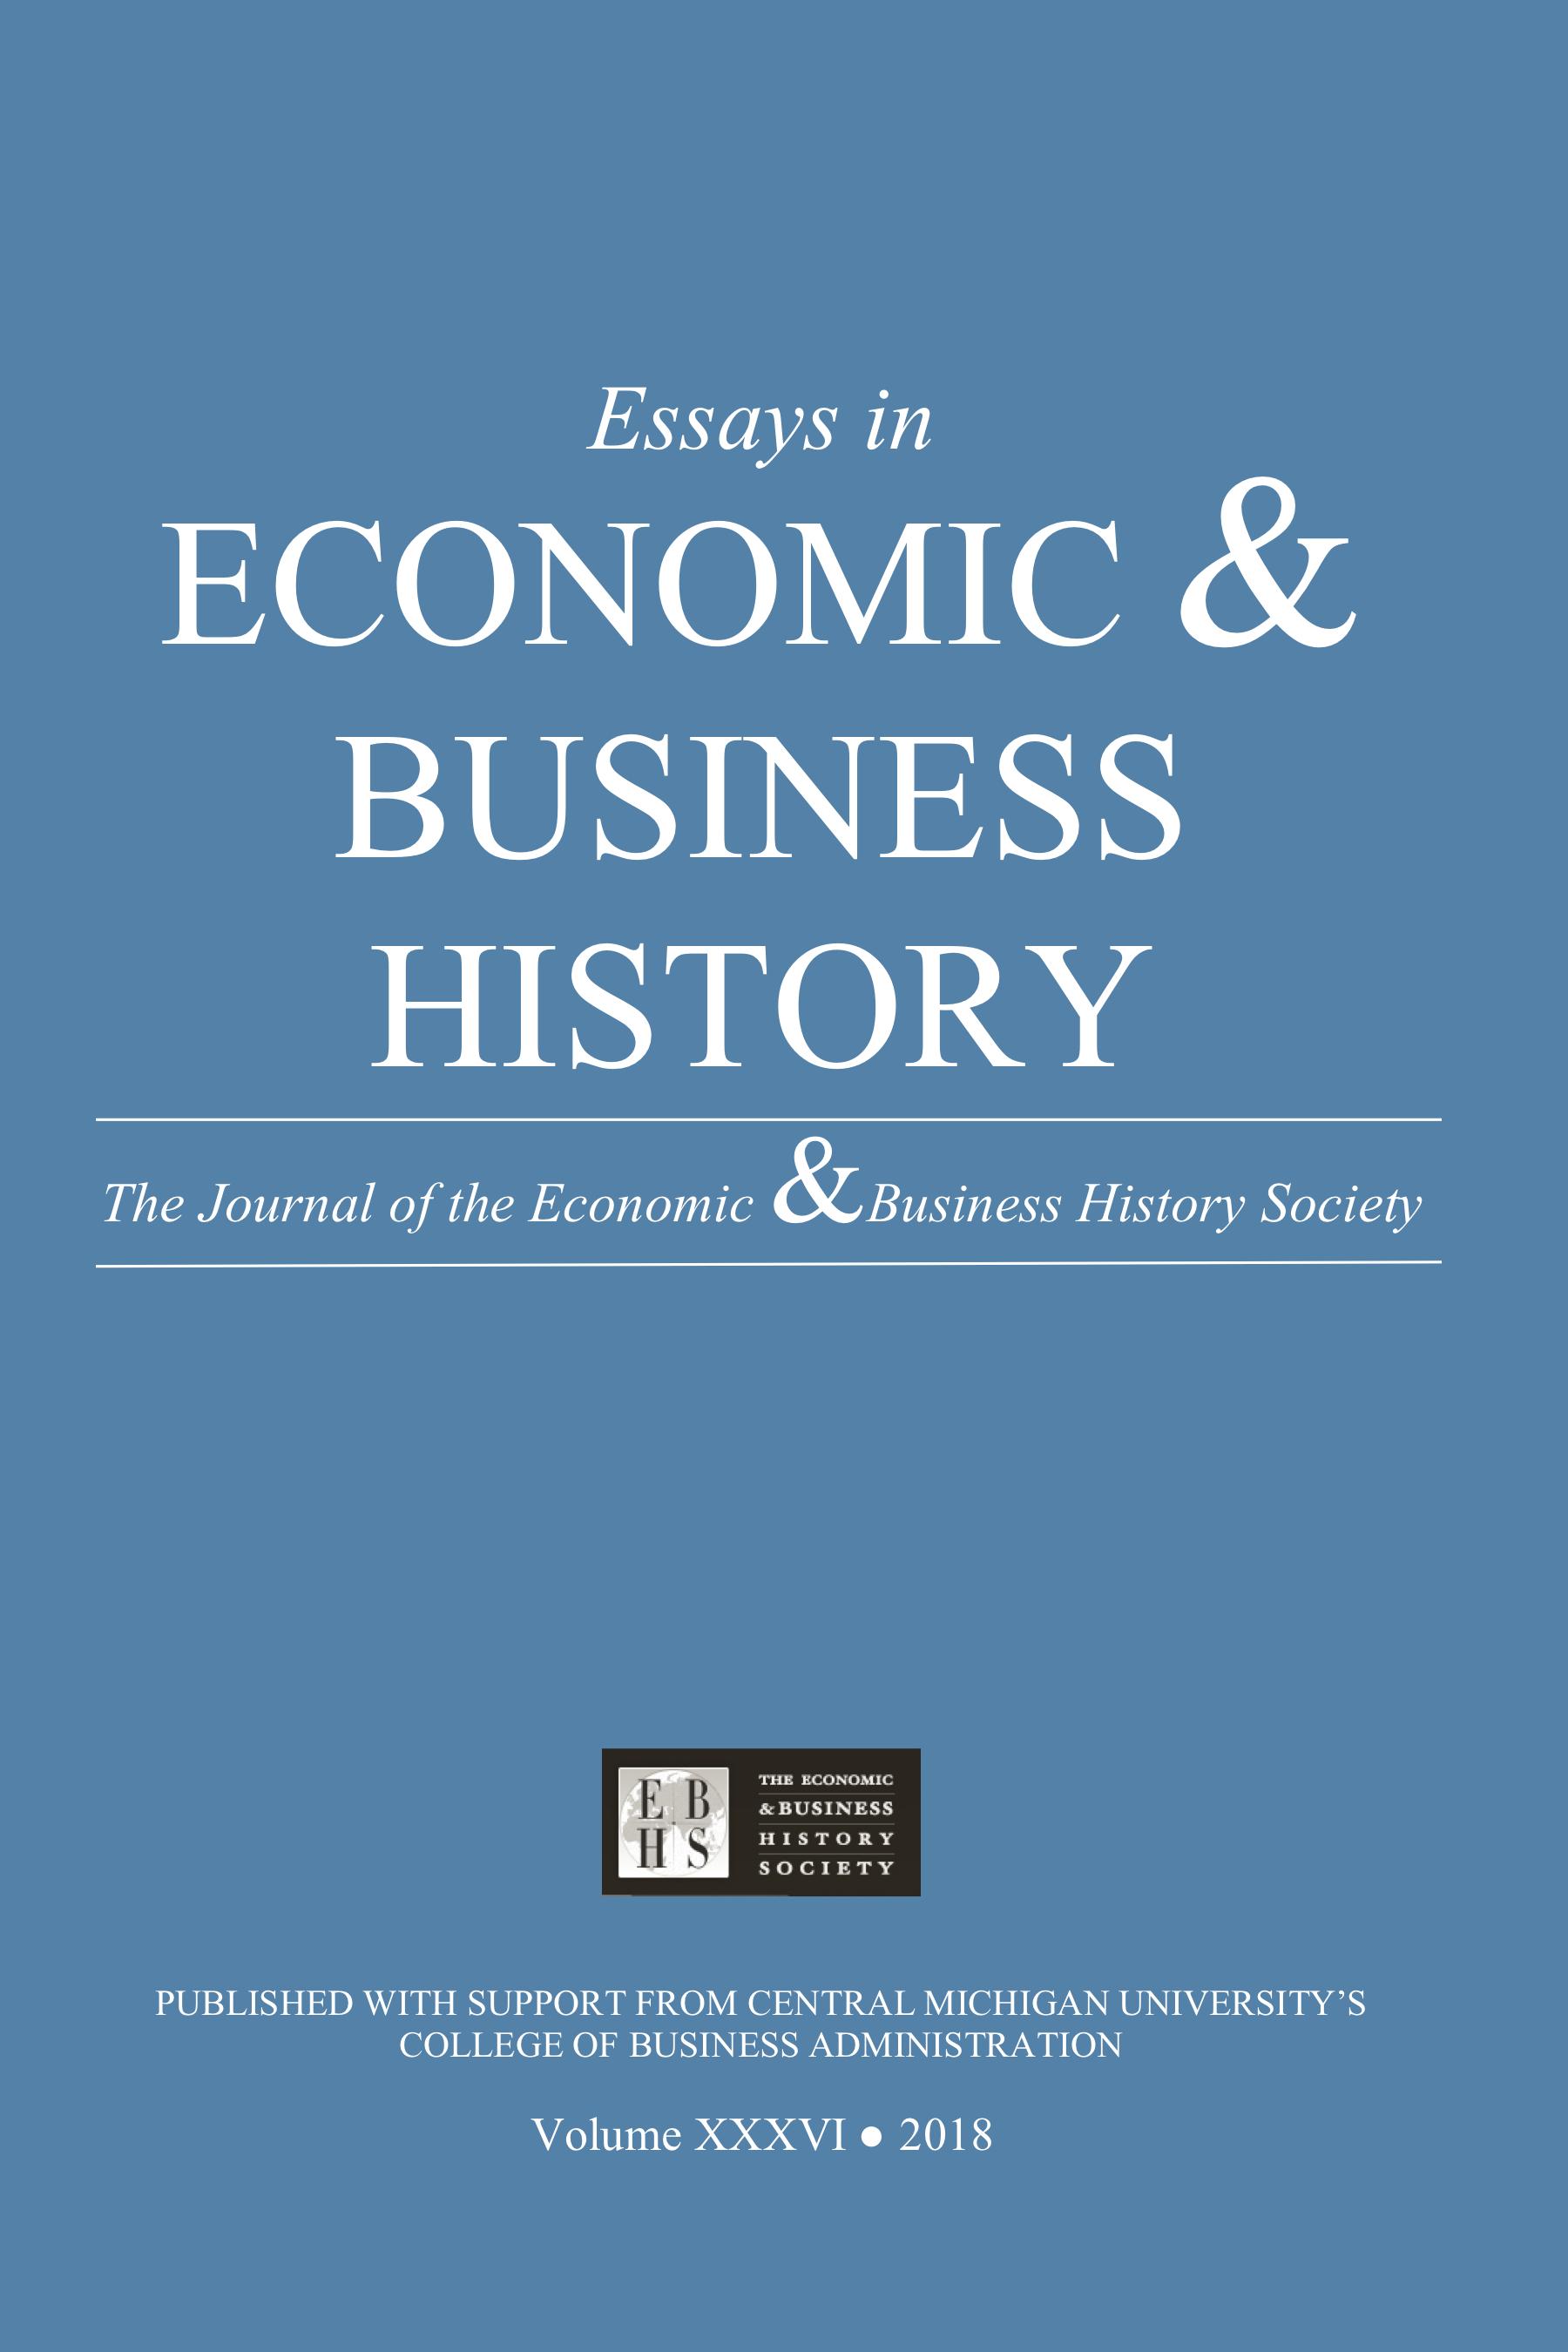 Essays in Economic & Business History 2018